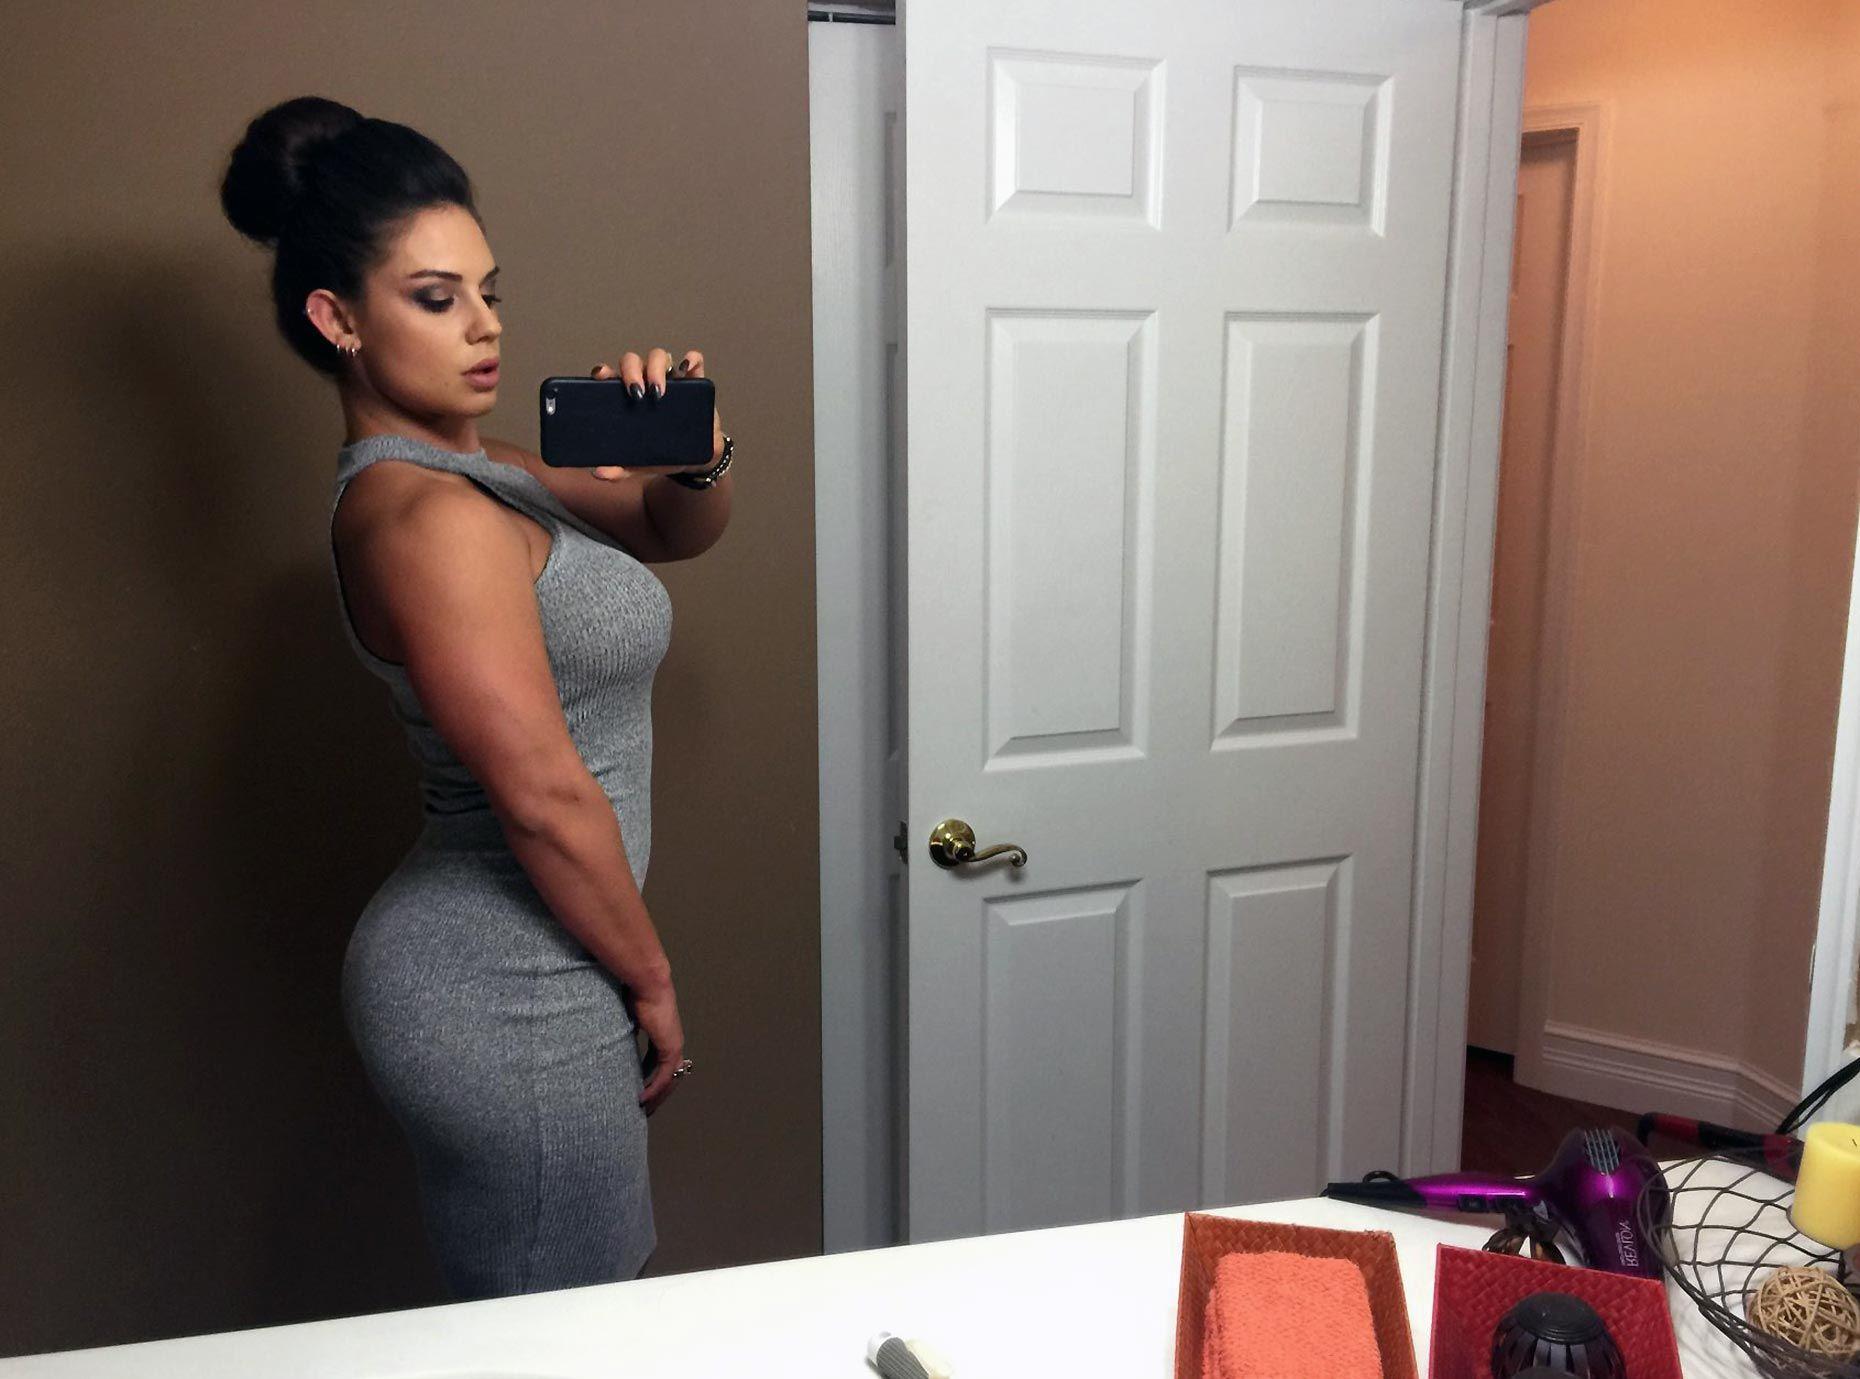 Celeste Bonin Nude Leaked The Fappening & Sexy 0159